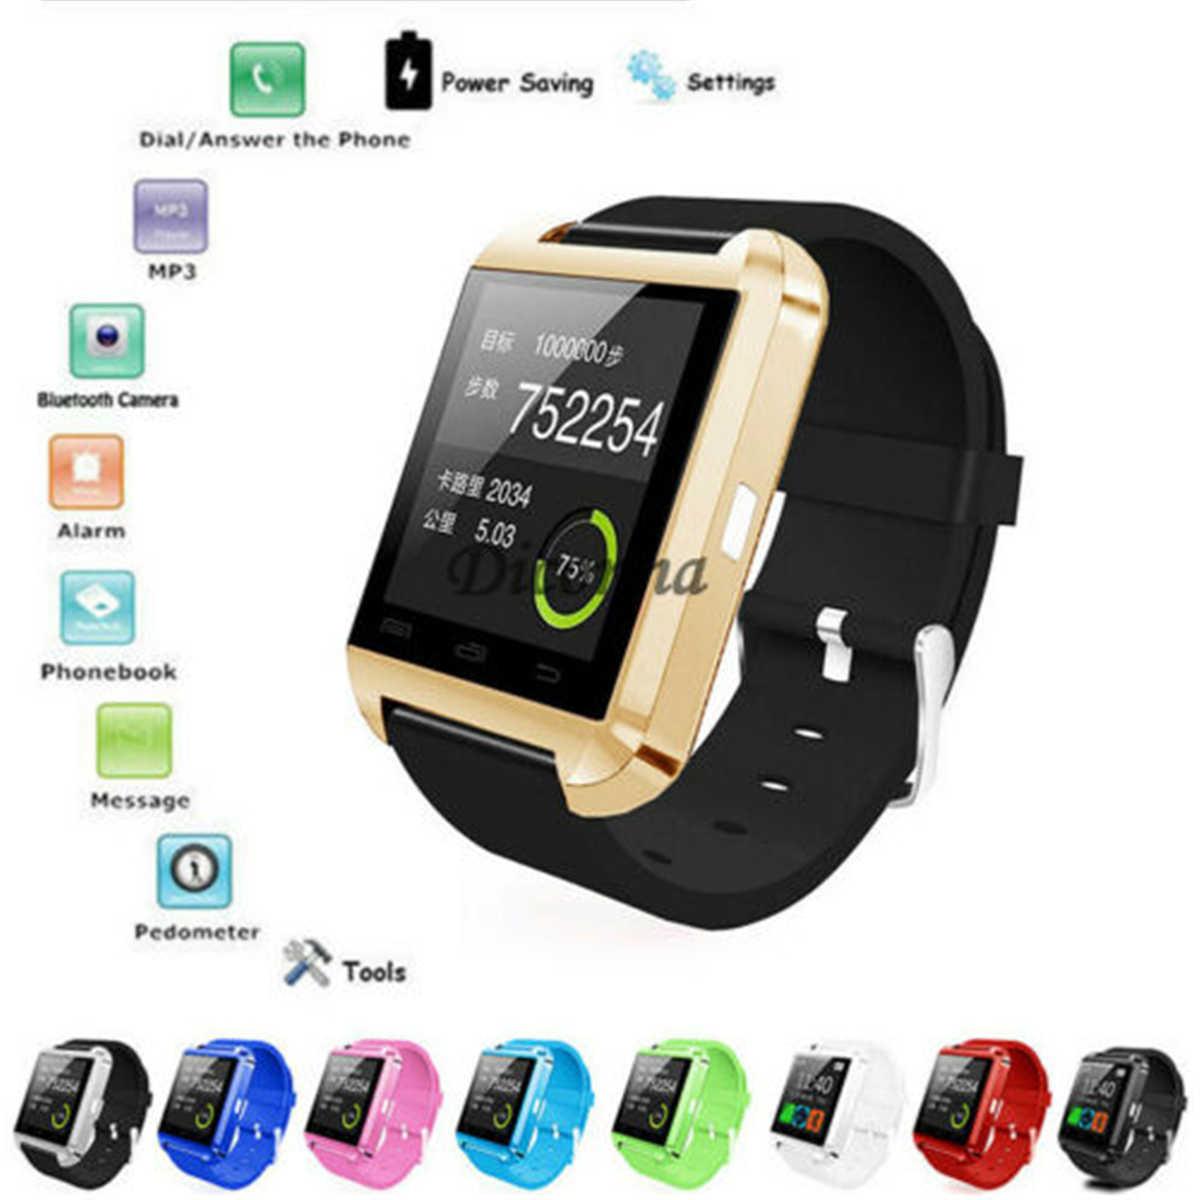 U8 חכם שעון Bluetooth טלפון Mate עבור אנדרואיד IOS iPhone סמסונג LG HTC יוניסקס